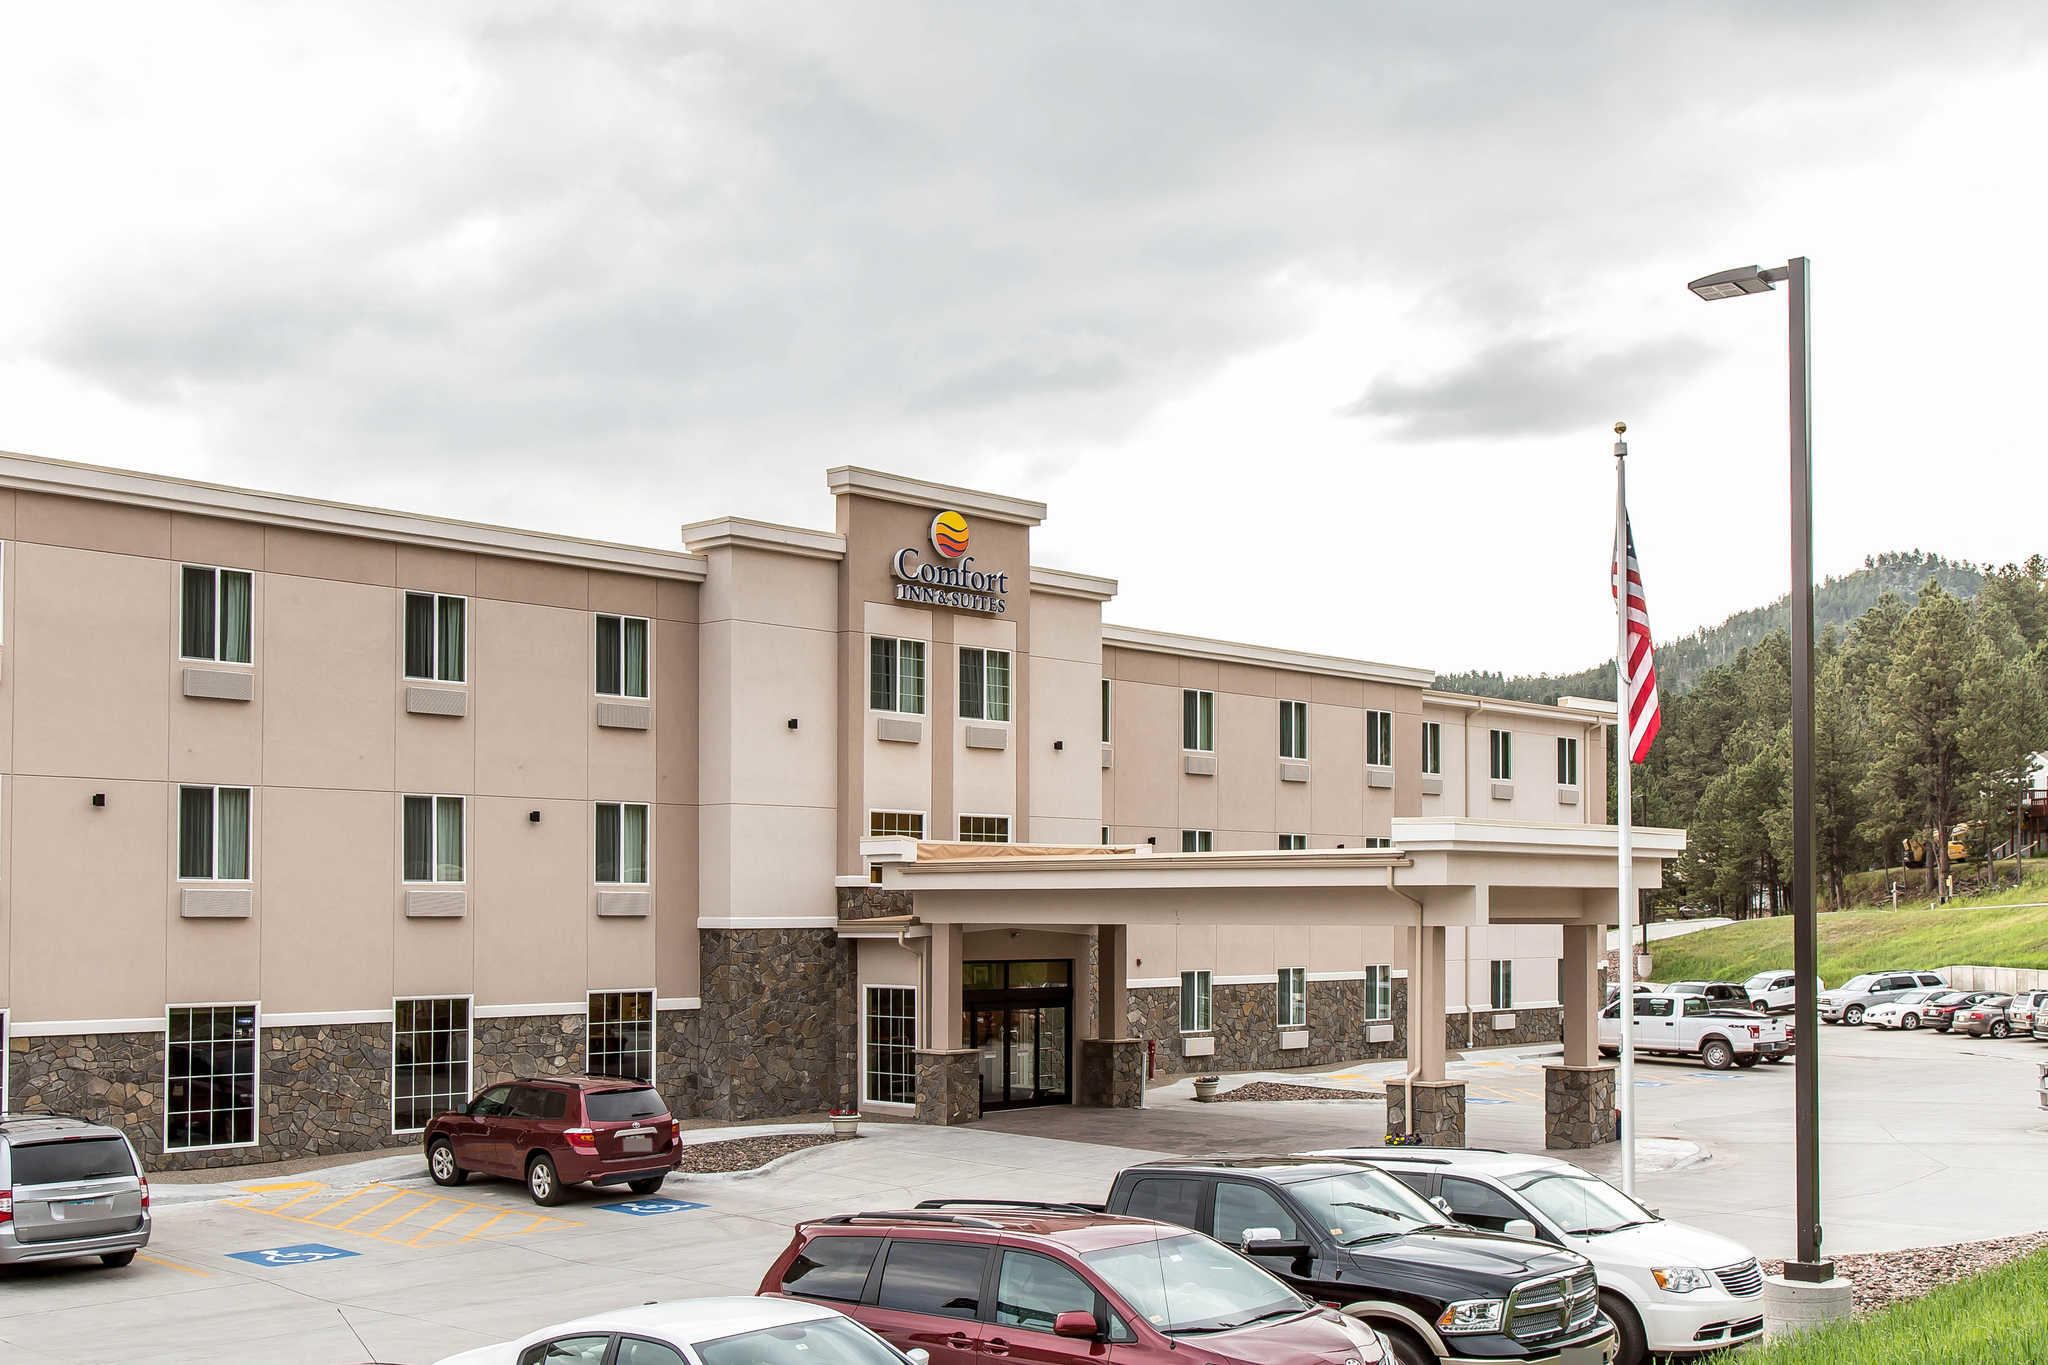 Comfort Inn & Suites Near Mt. Rushmore image 2